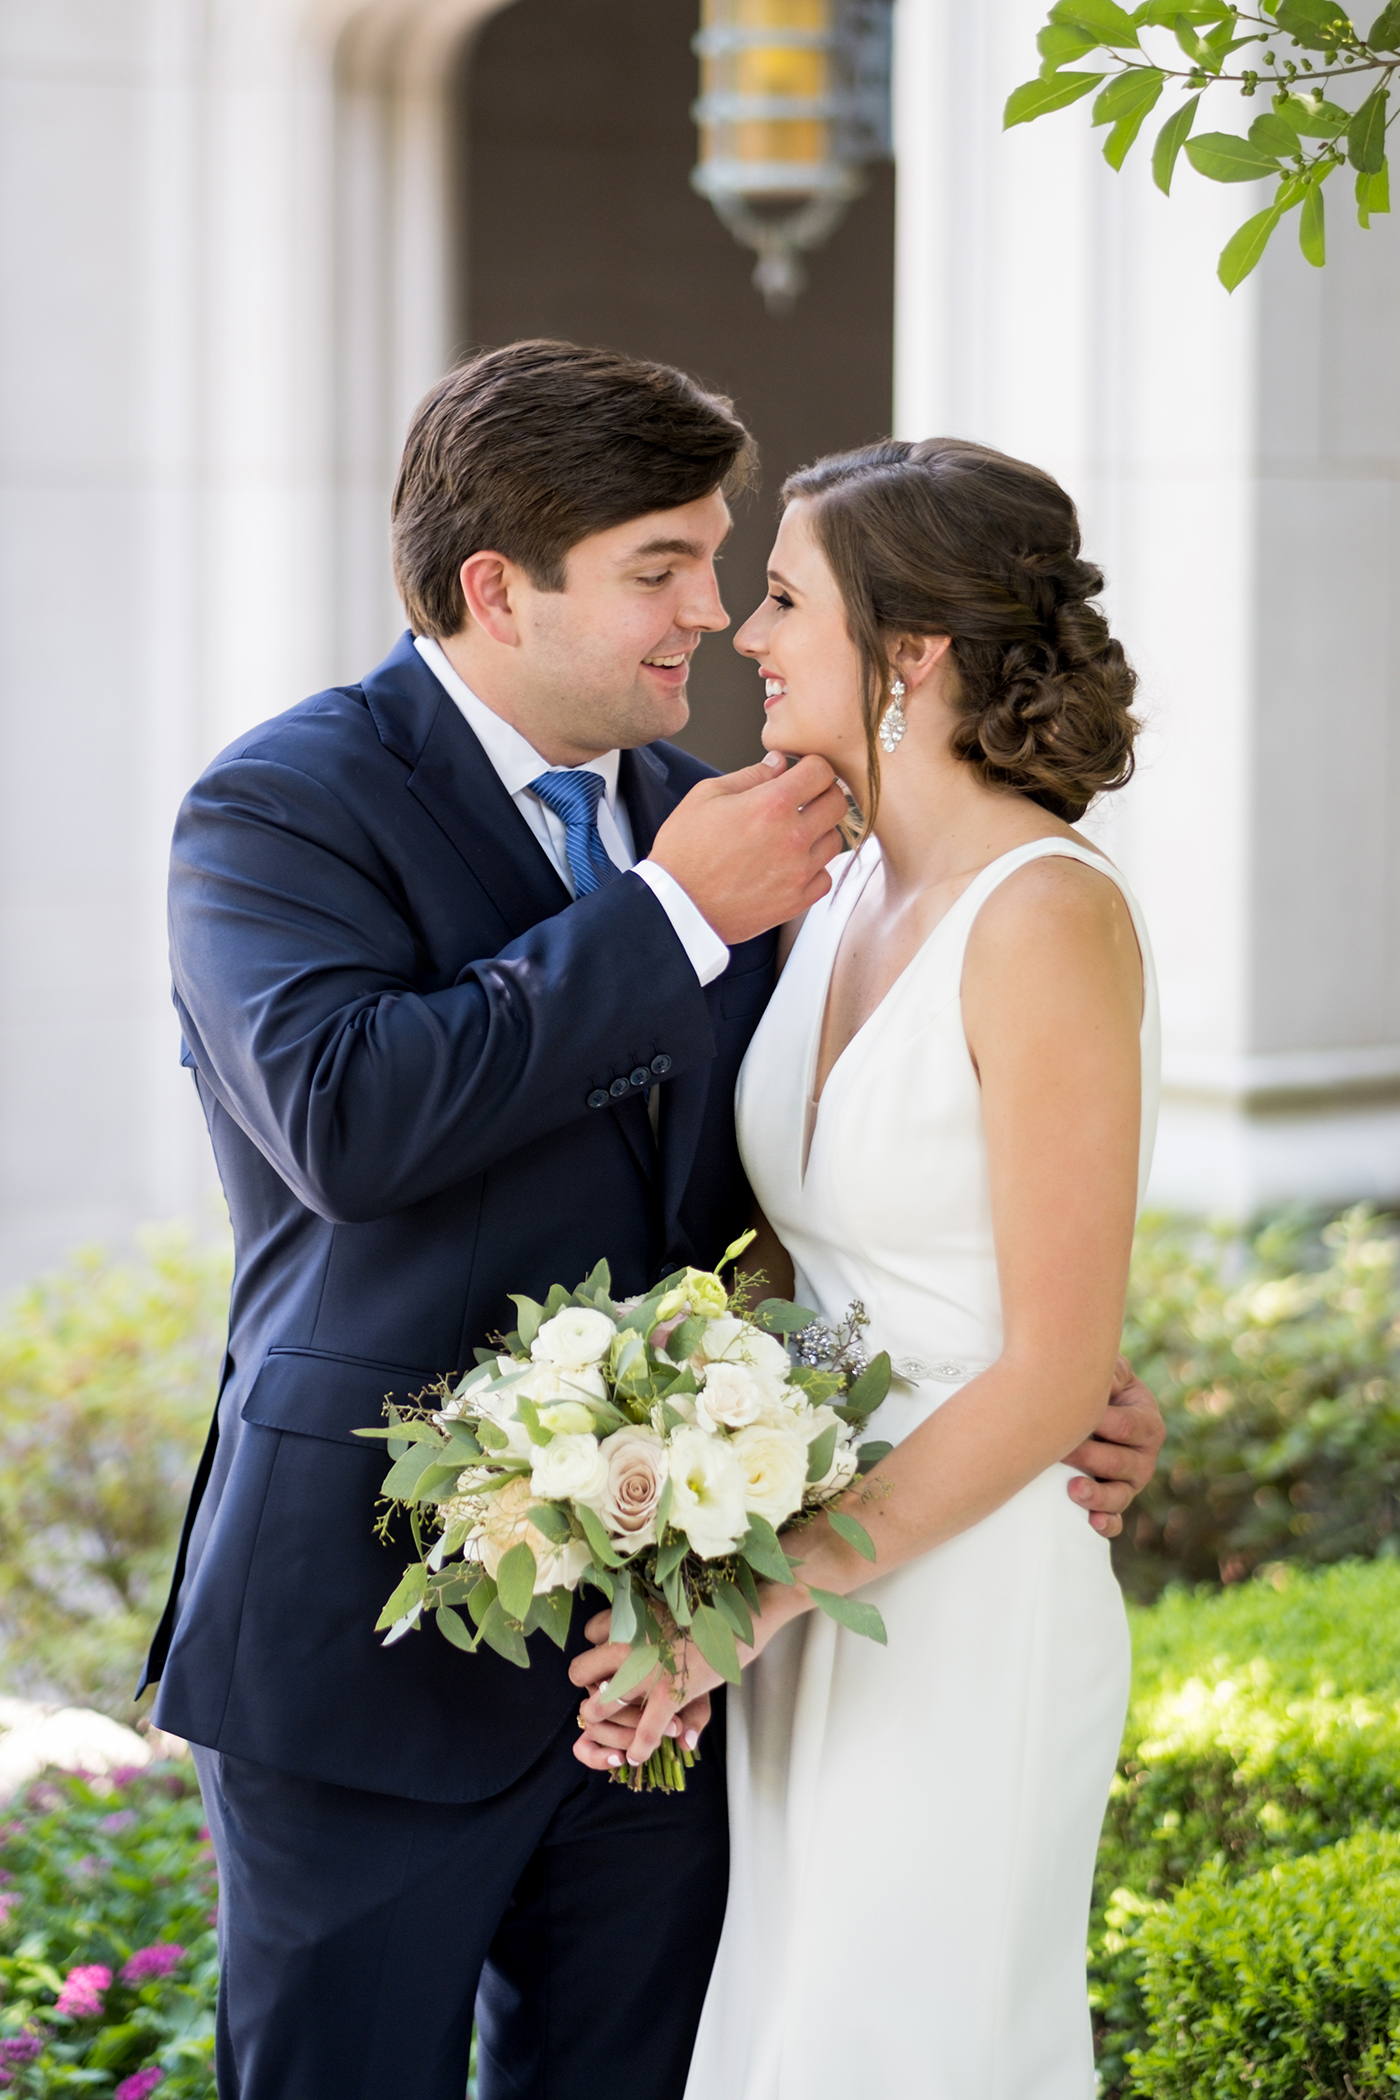 Wedding Planner Dallas TX - Allday Events - Highland Park - Marie Gabrielle Wedding - 173.jpg